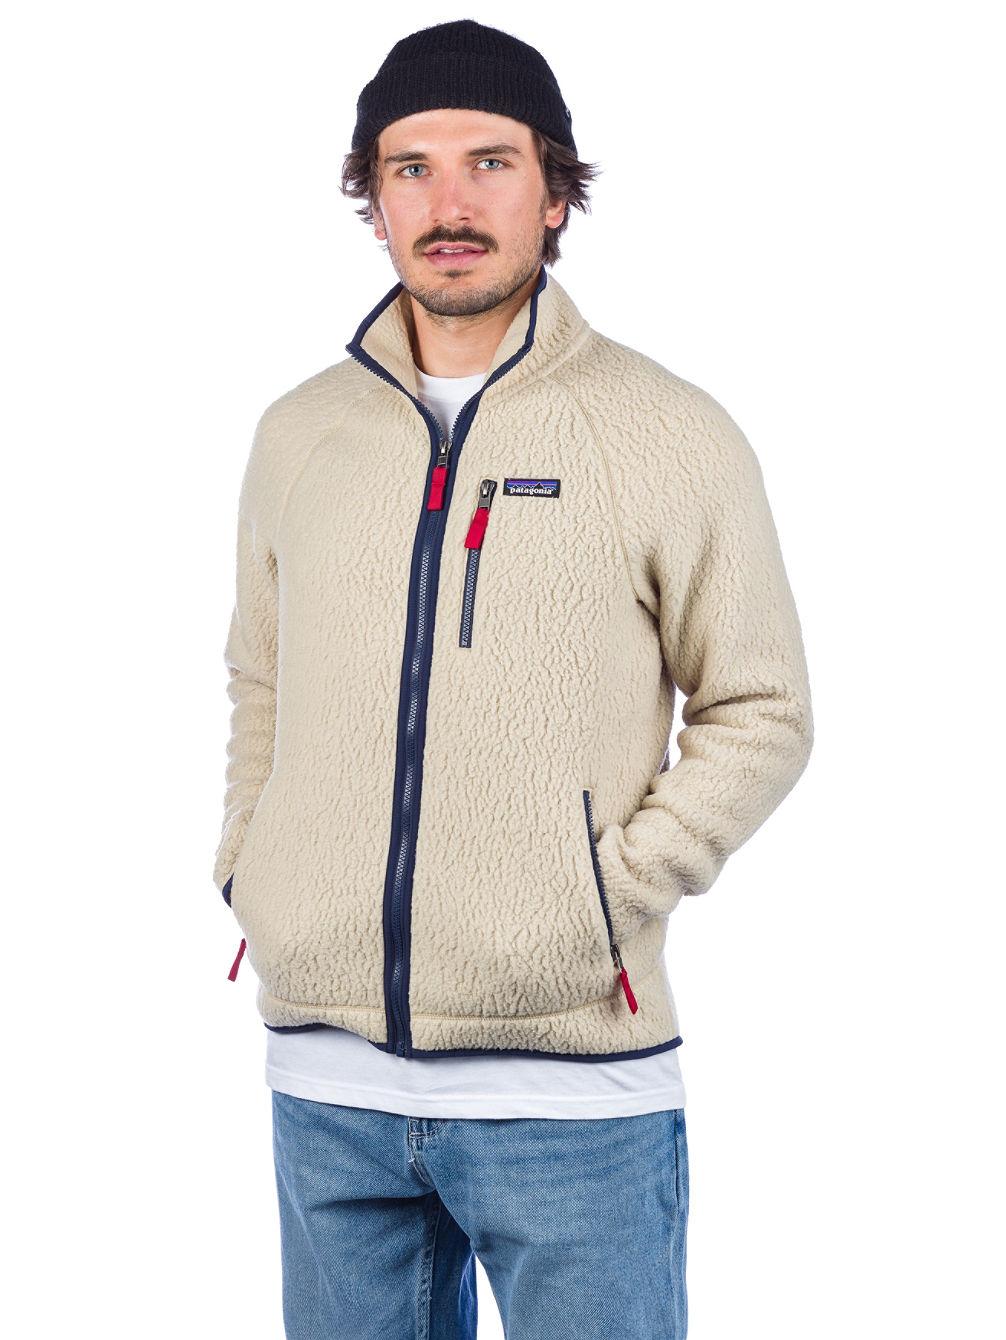 the latest f2868 5578a Retro Pile Fleece Jacket